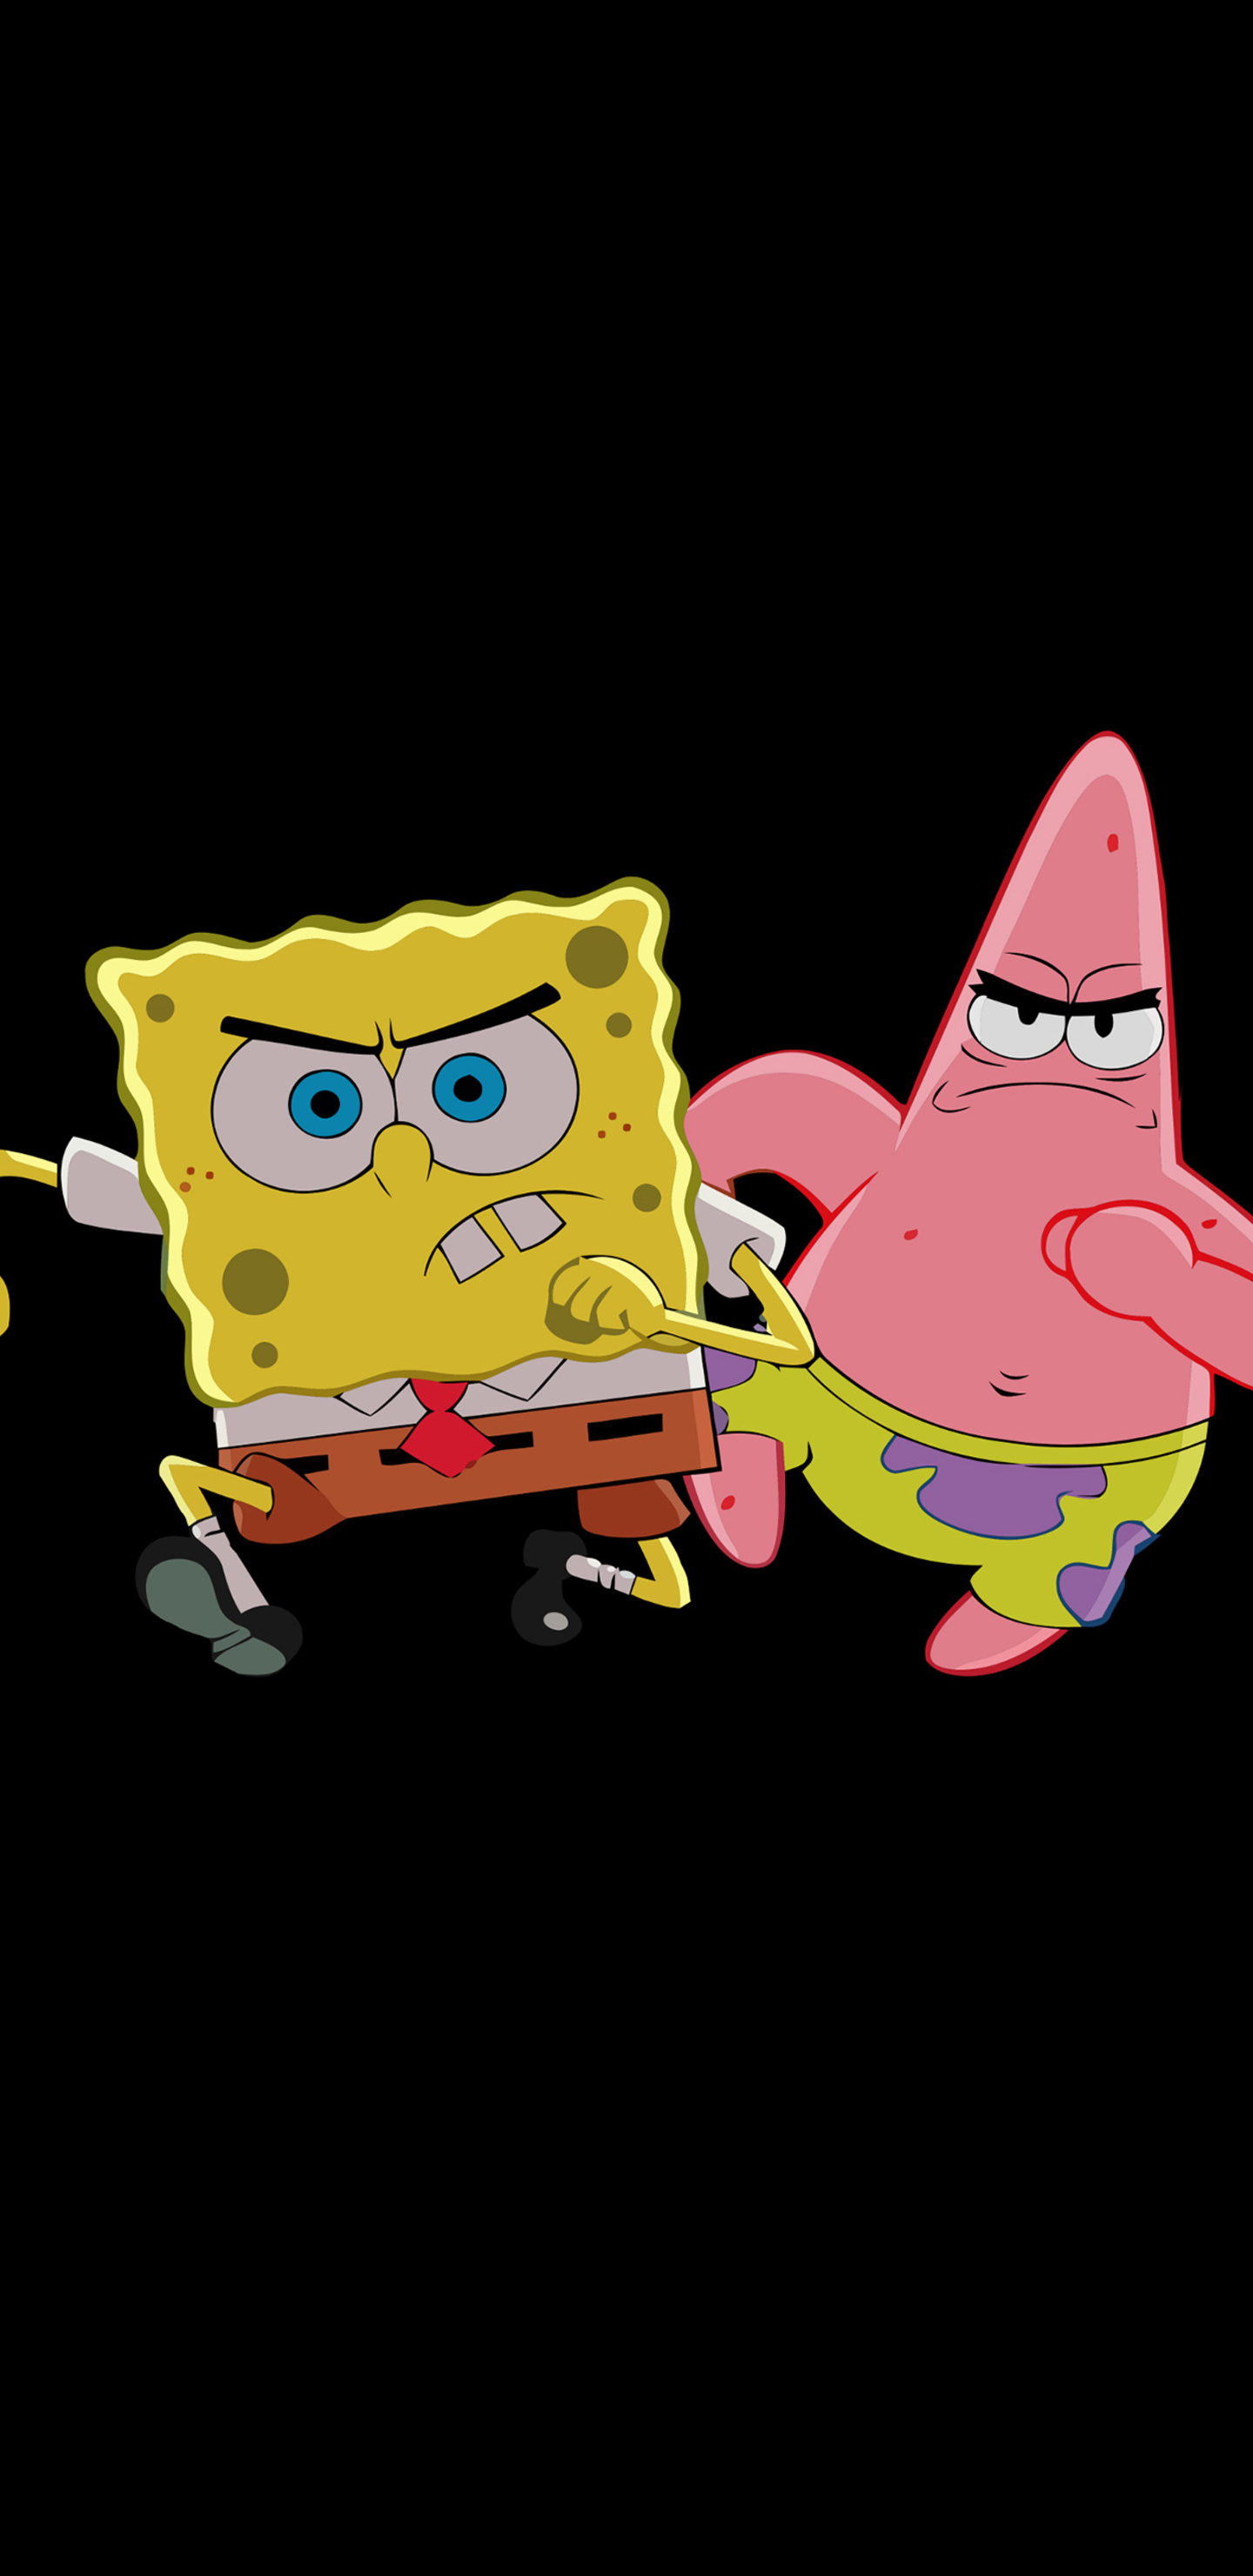 1440x2960 Patrick Star And Spongebob Samsung Galaxy Note 98